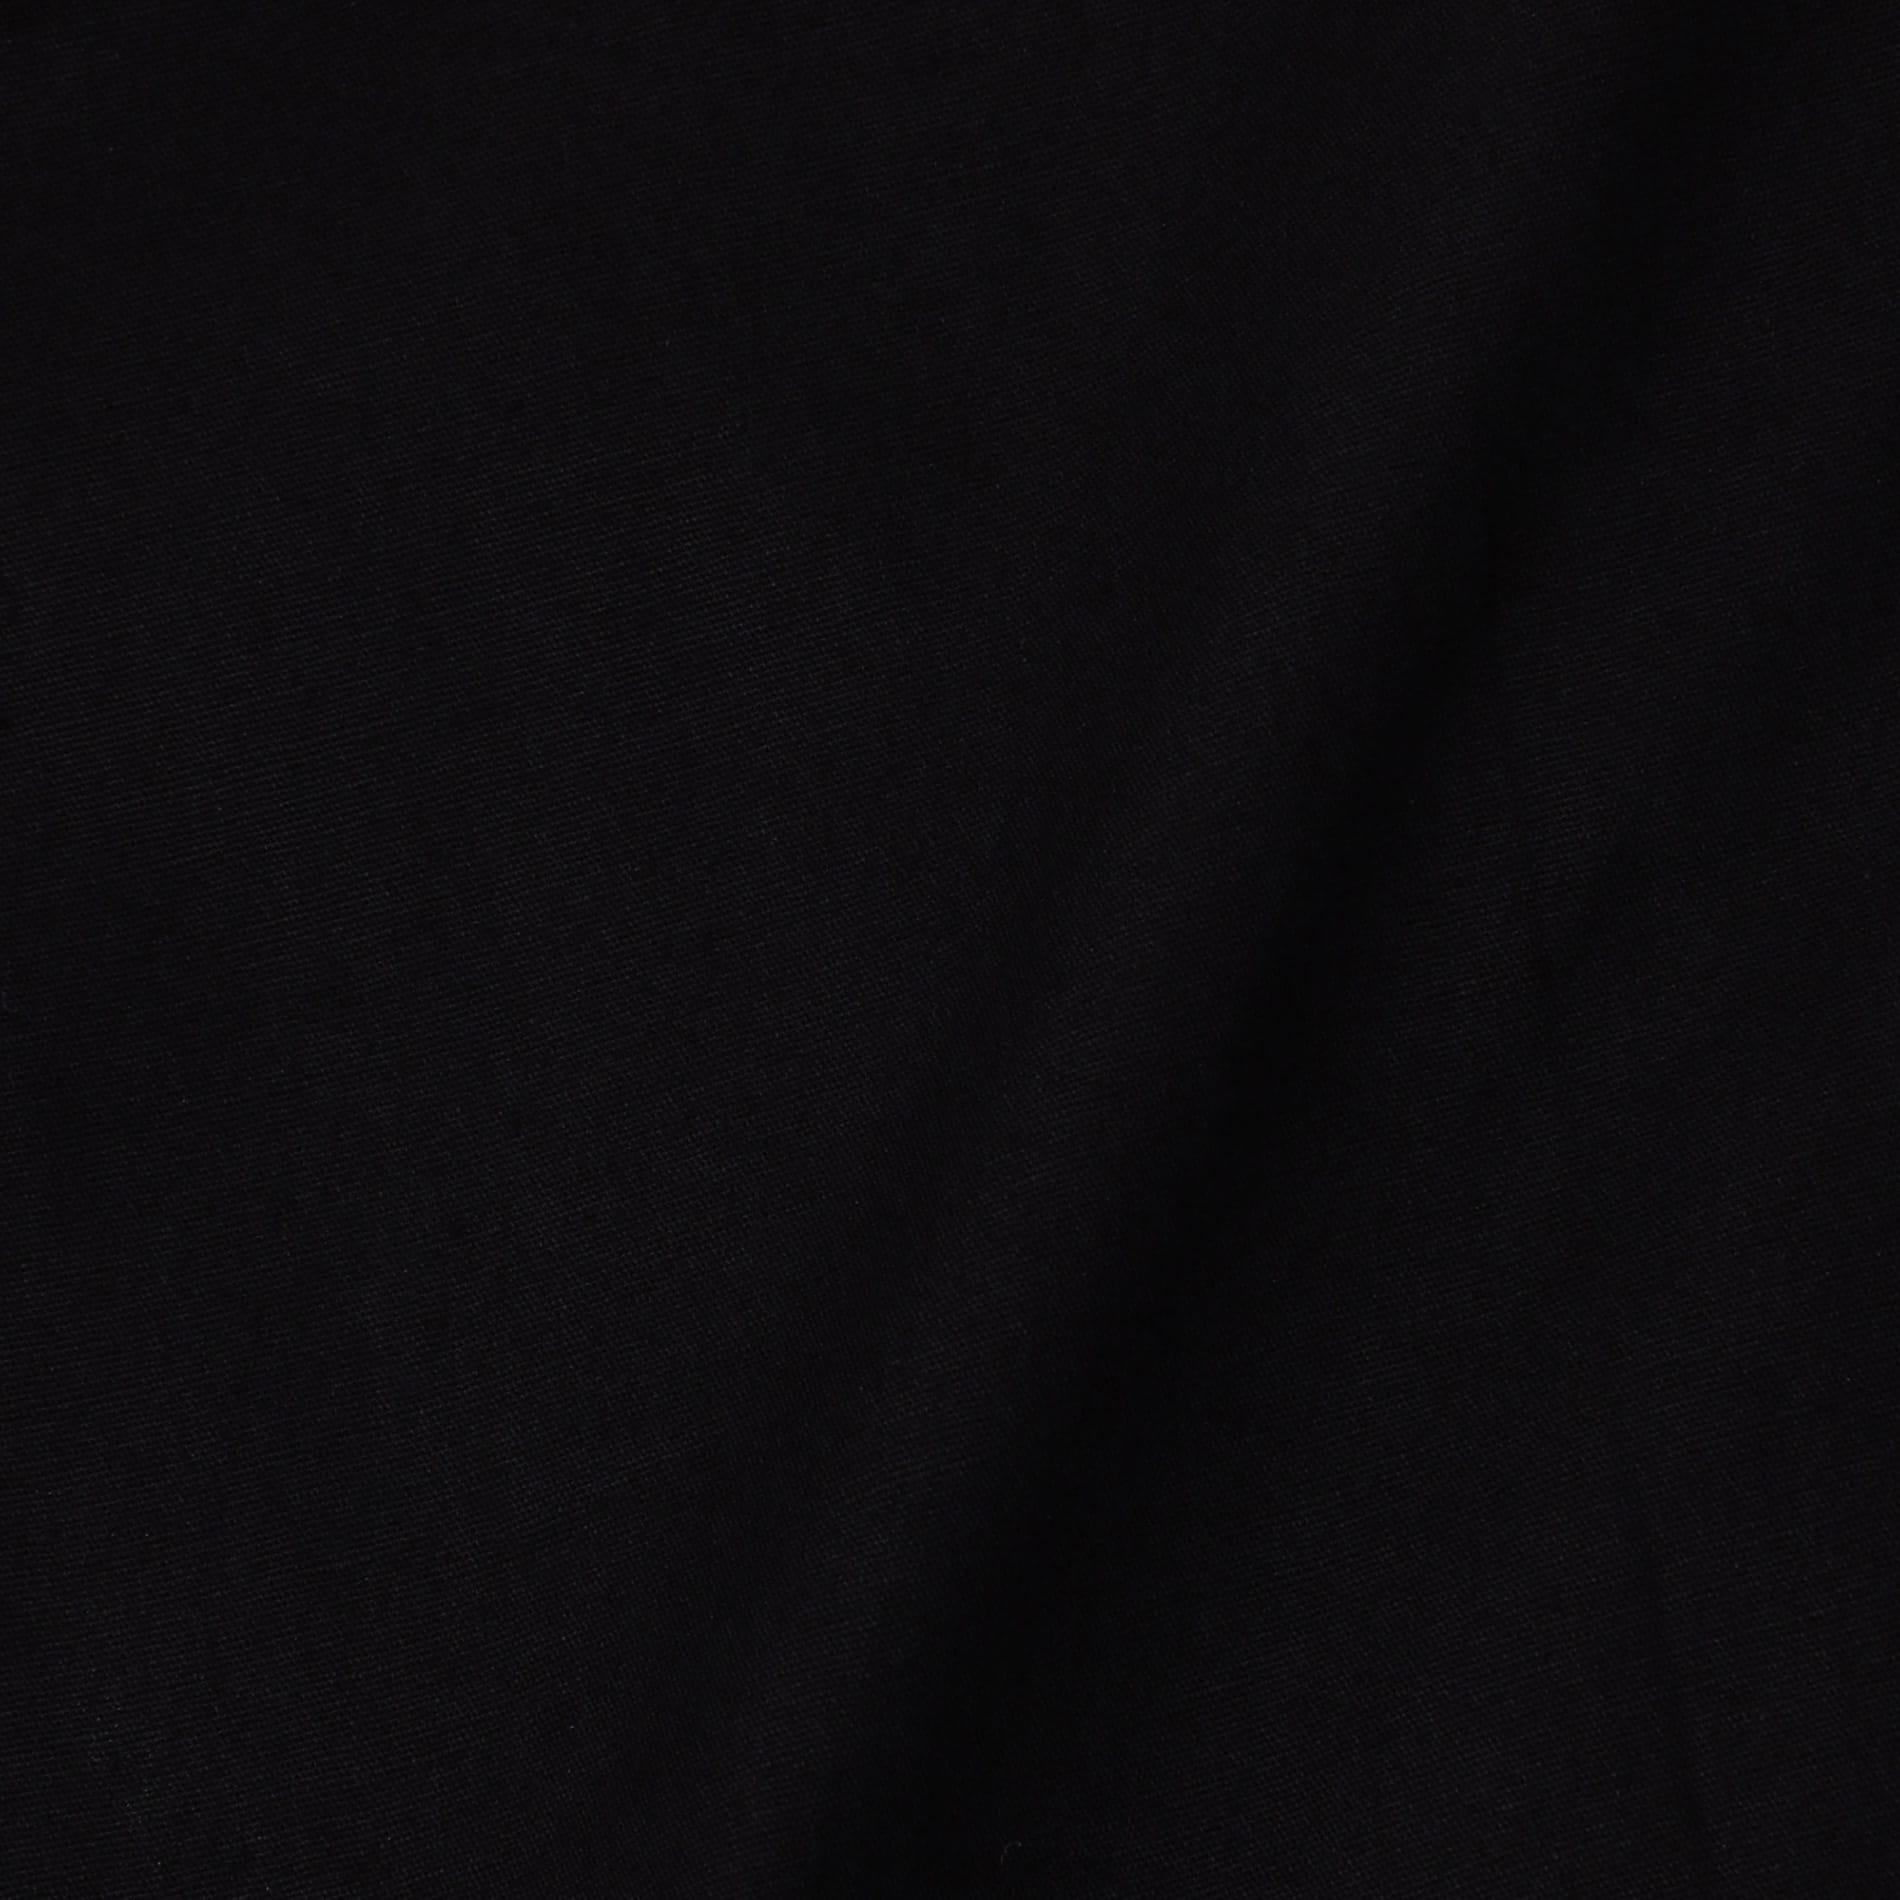 【NOMA t.d.】MEN シャツ Floral Emb SS Shirt EM 02